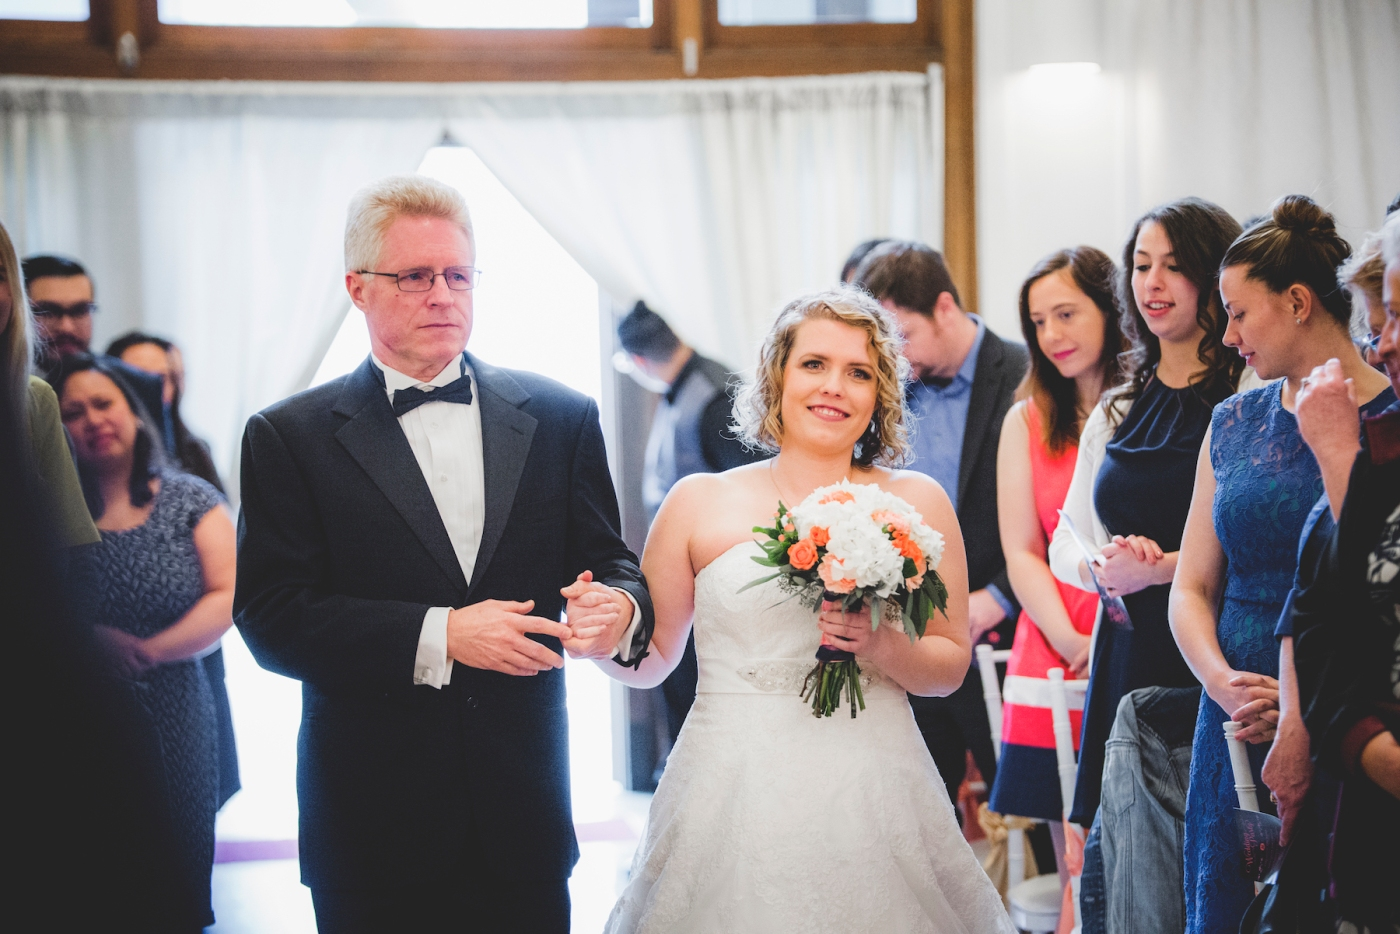 DSC_2565Everett_Wedding_Ballroom_Jane_Speleers_photography_Rachel_and_Edmund_Ceremony_2017